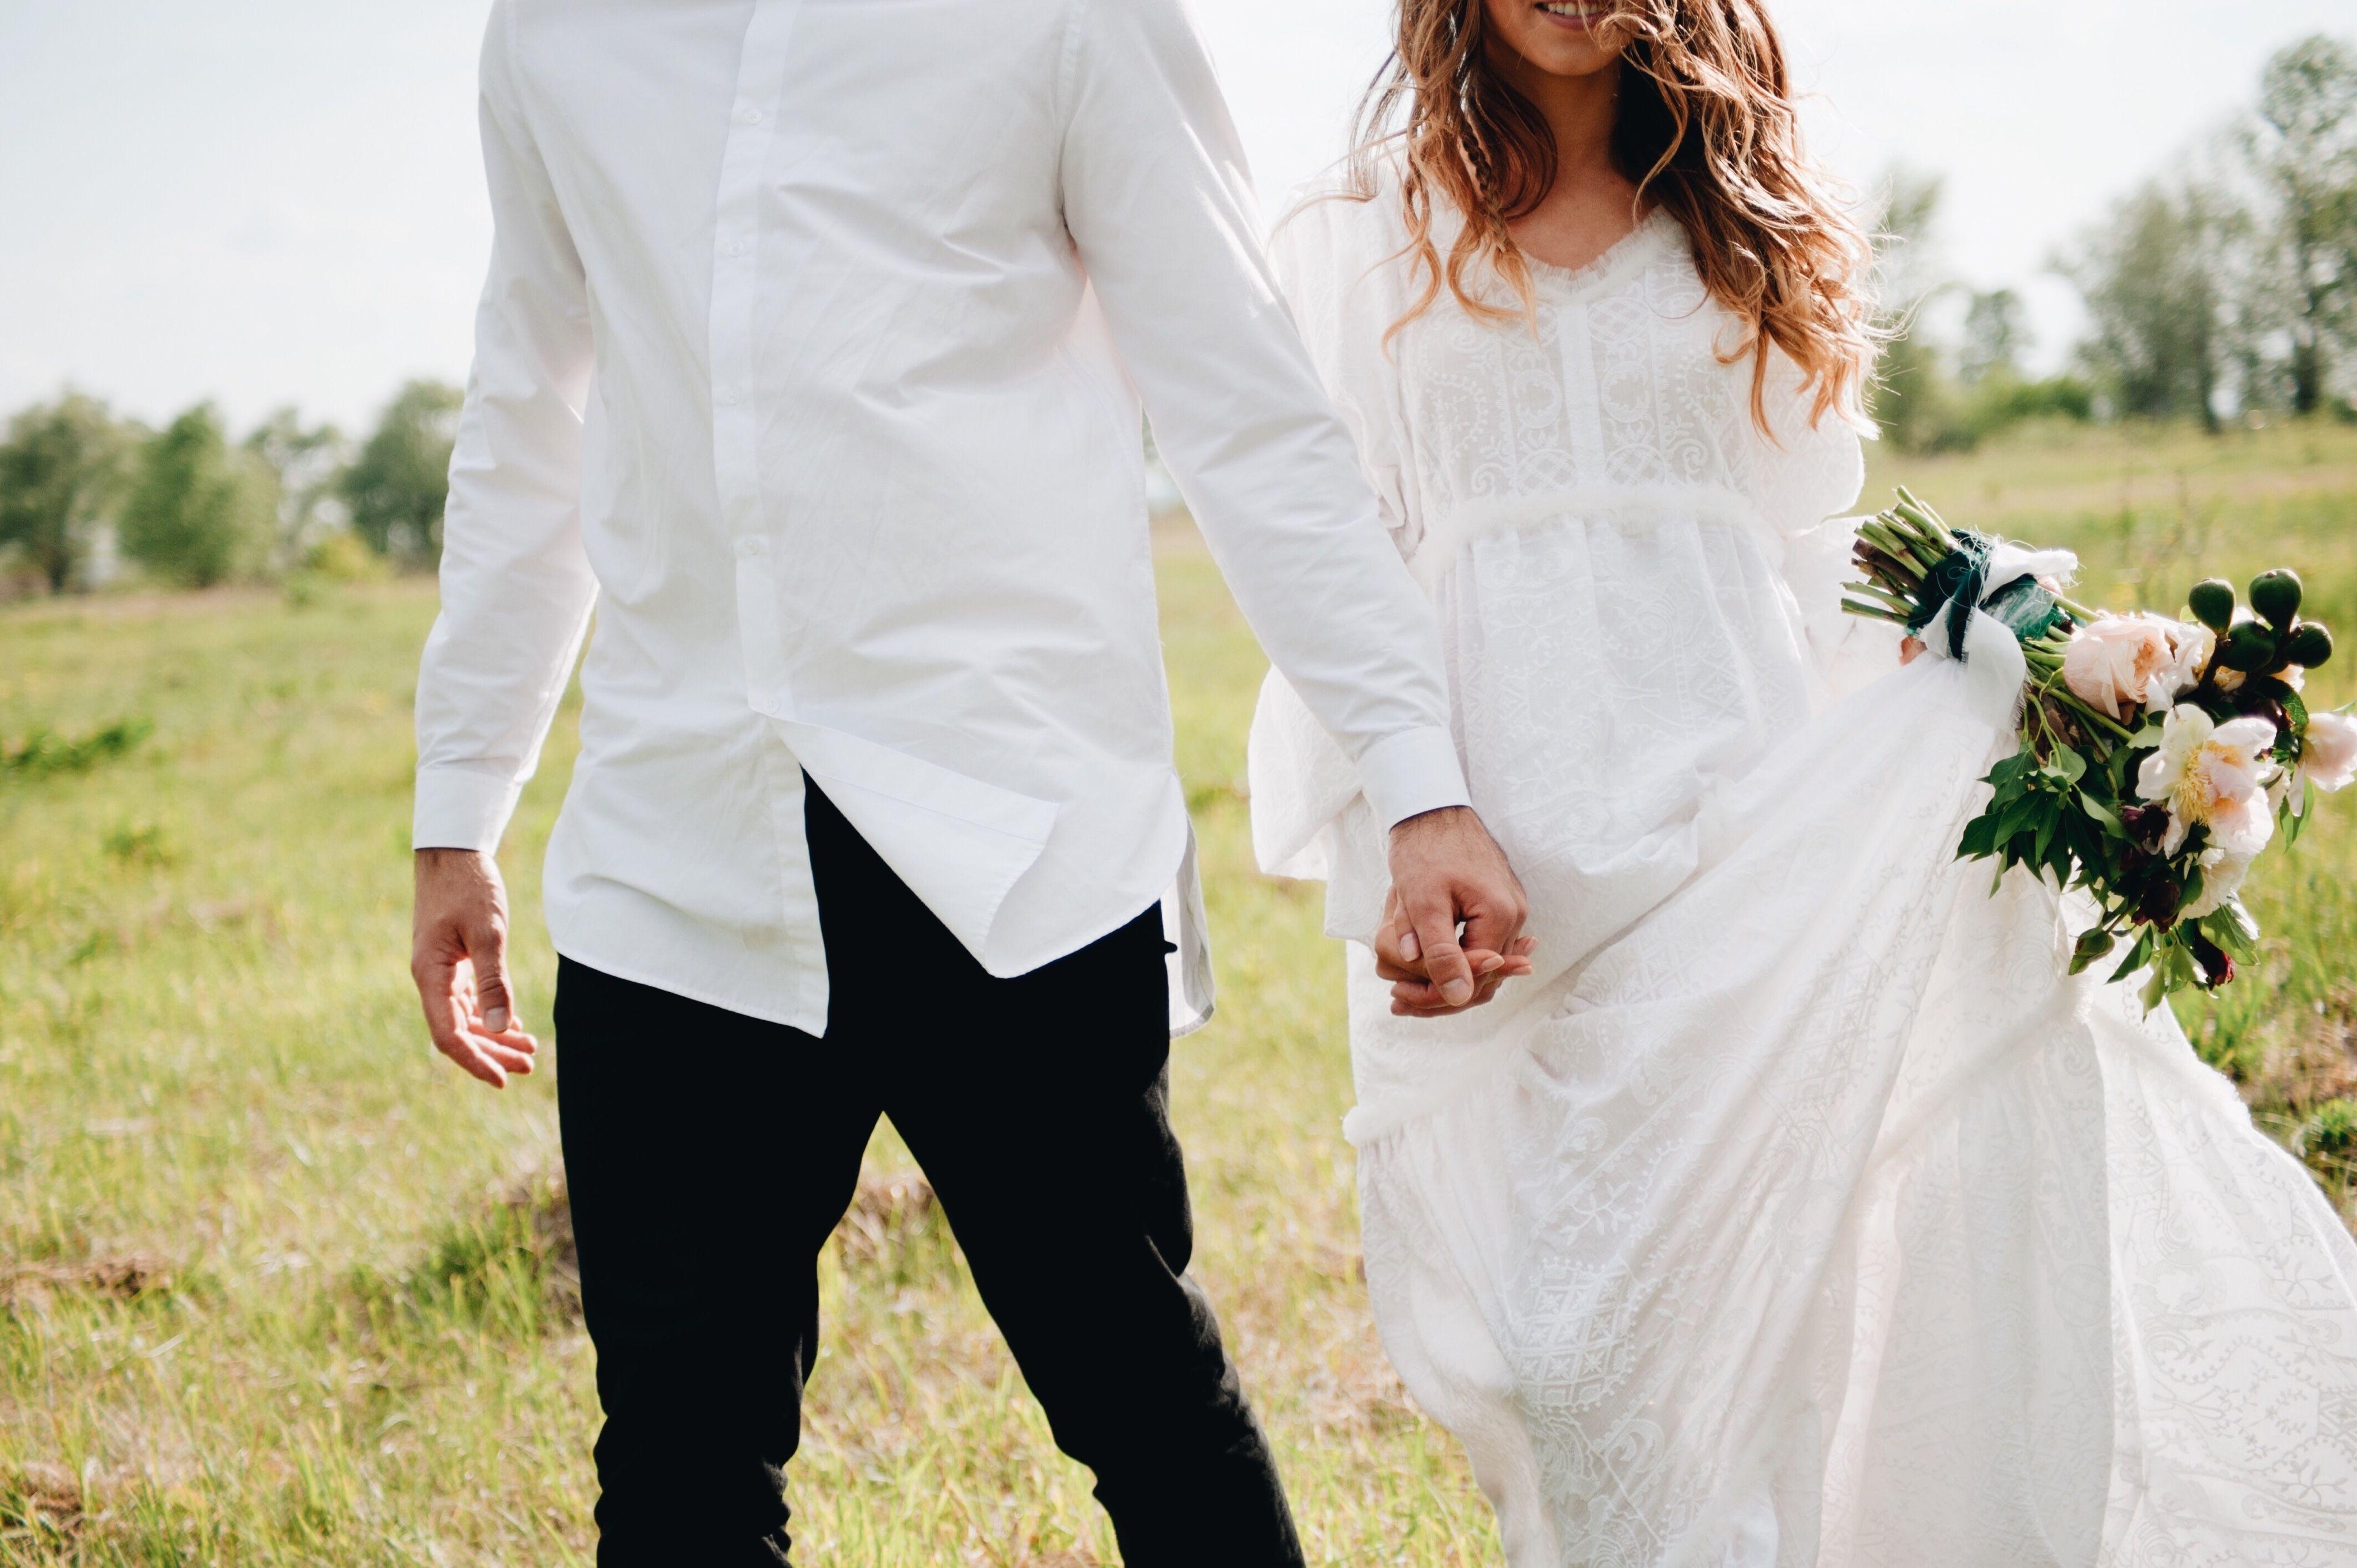 Pinterest reveals the most popular wedding trends of 10